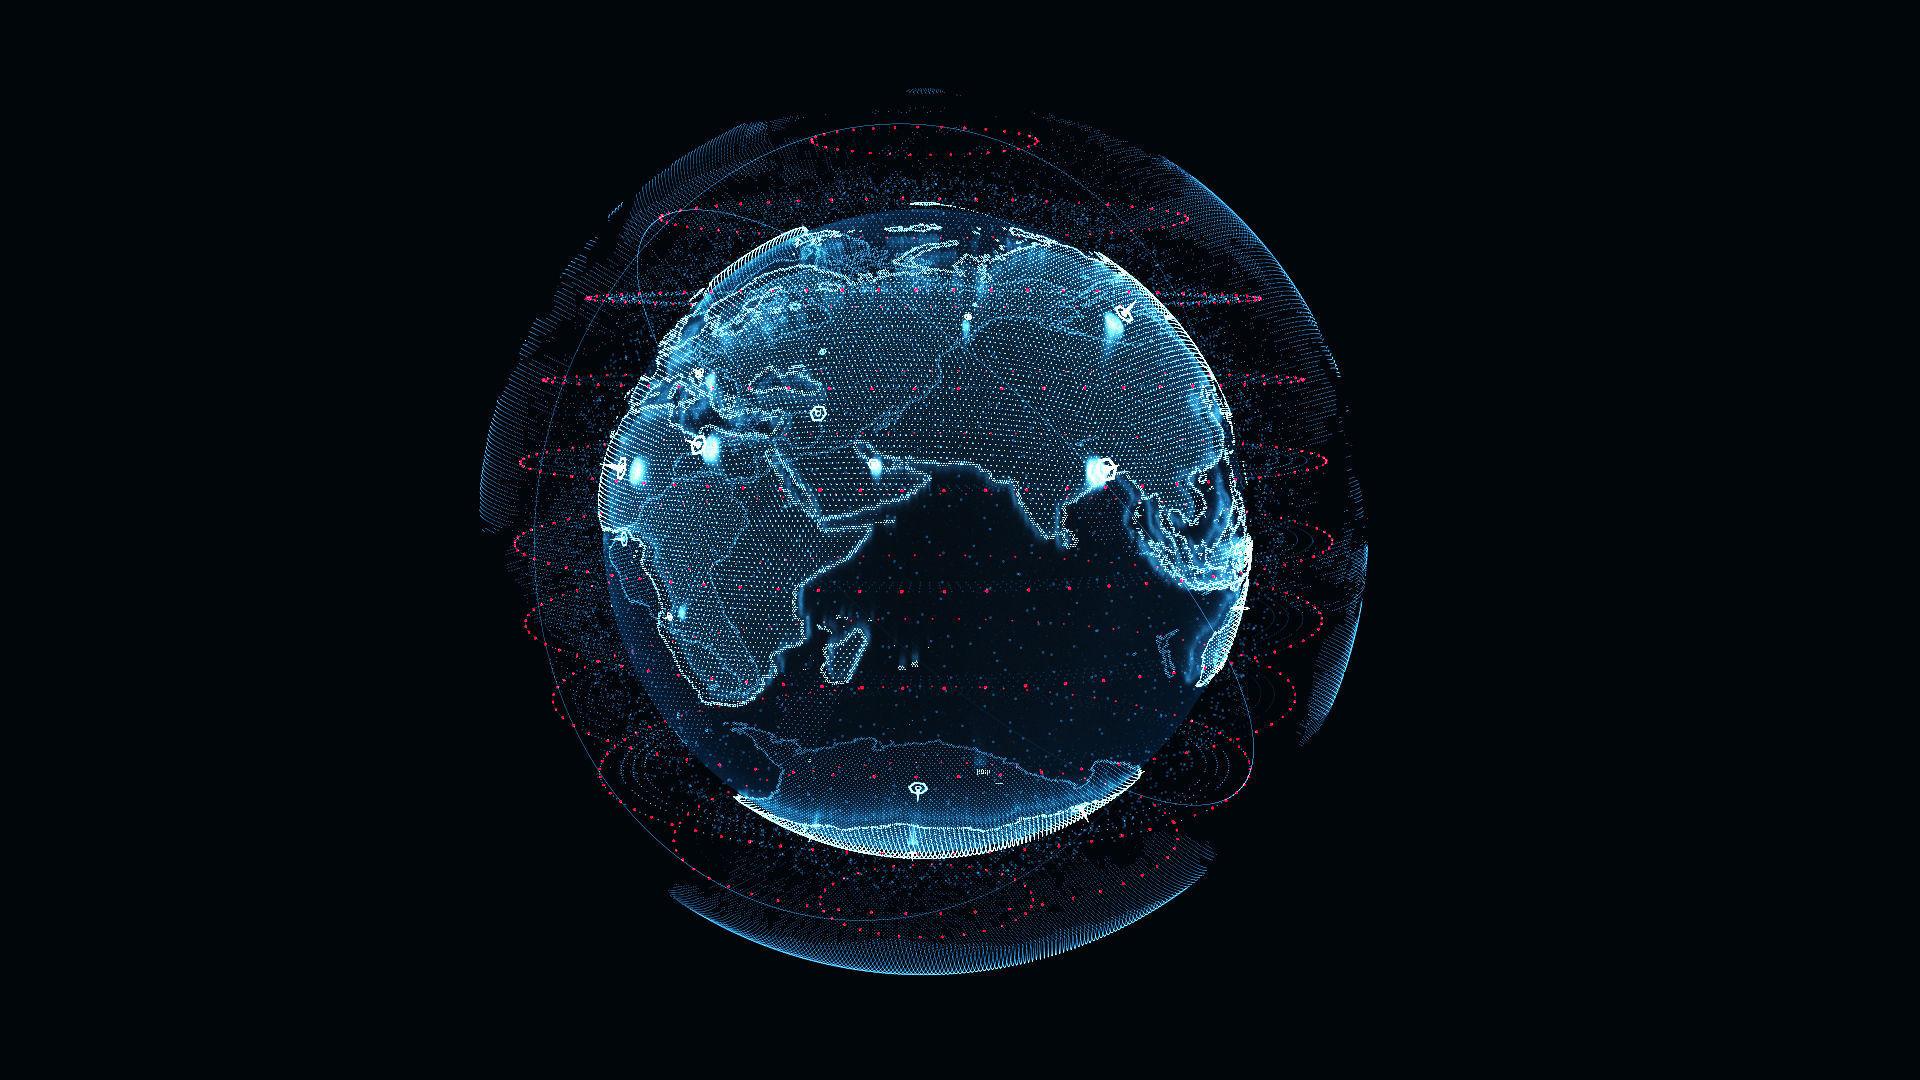 Animated Hologram Planet Earth v2